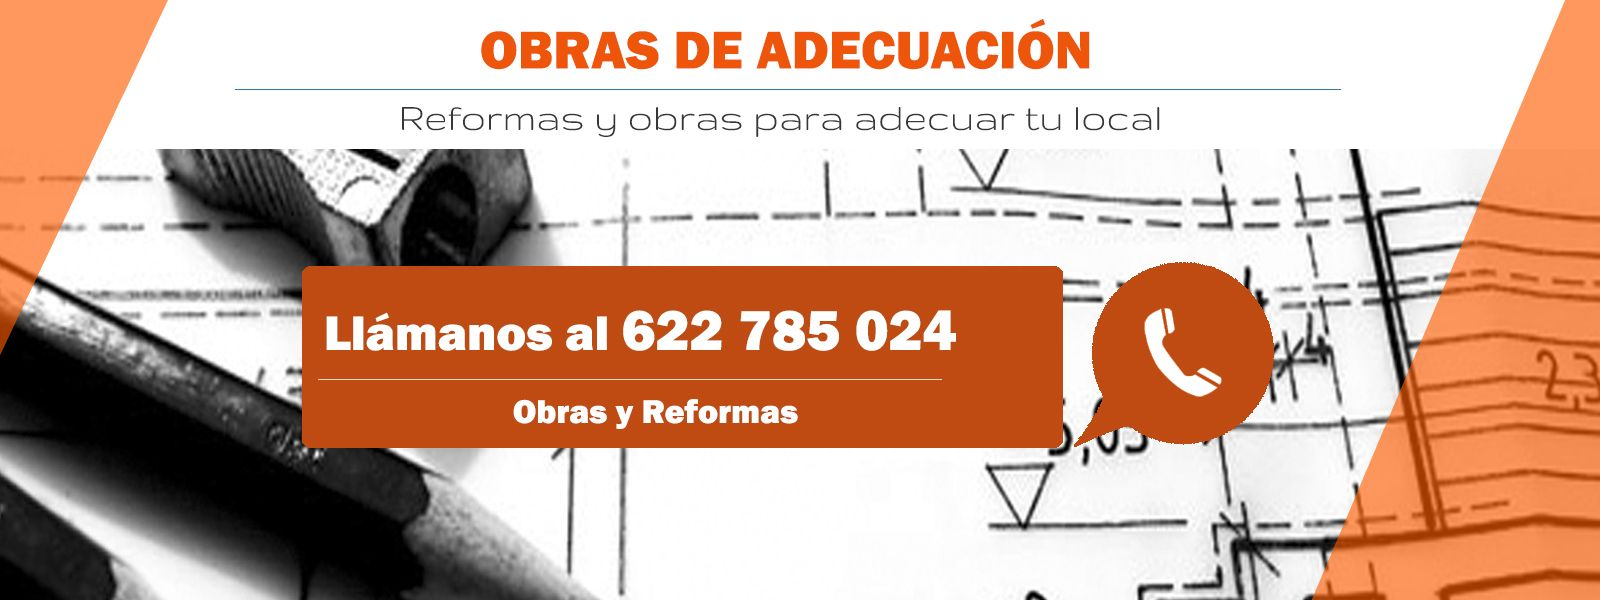 Obras de adecuación en Cádiz